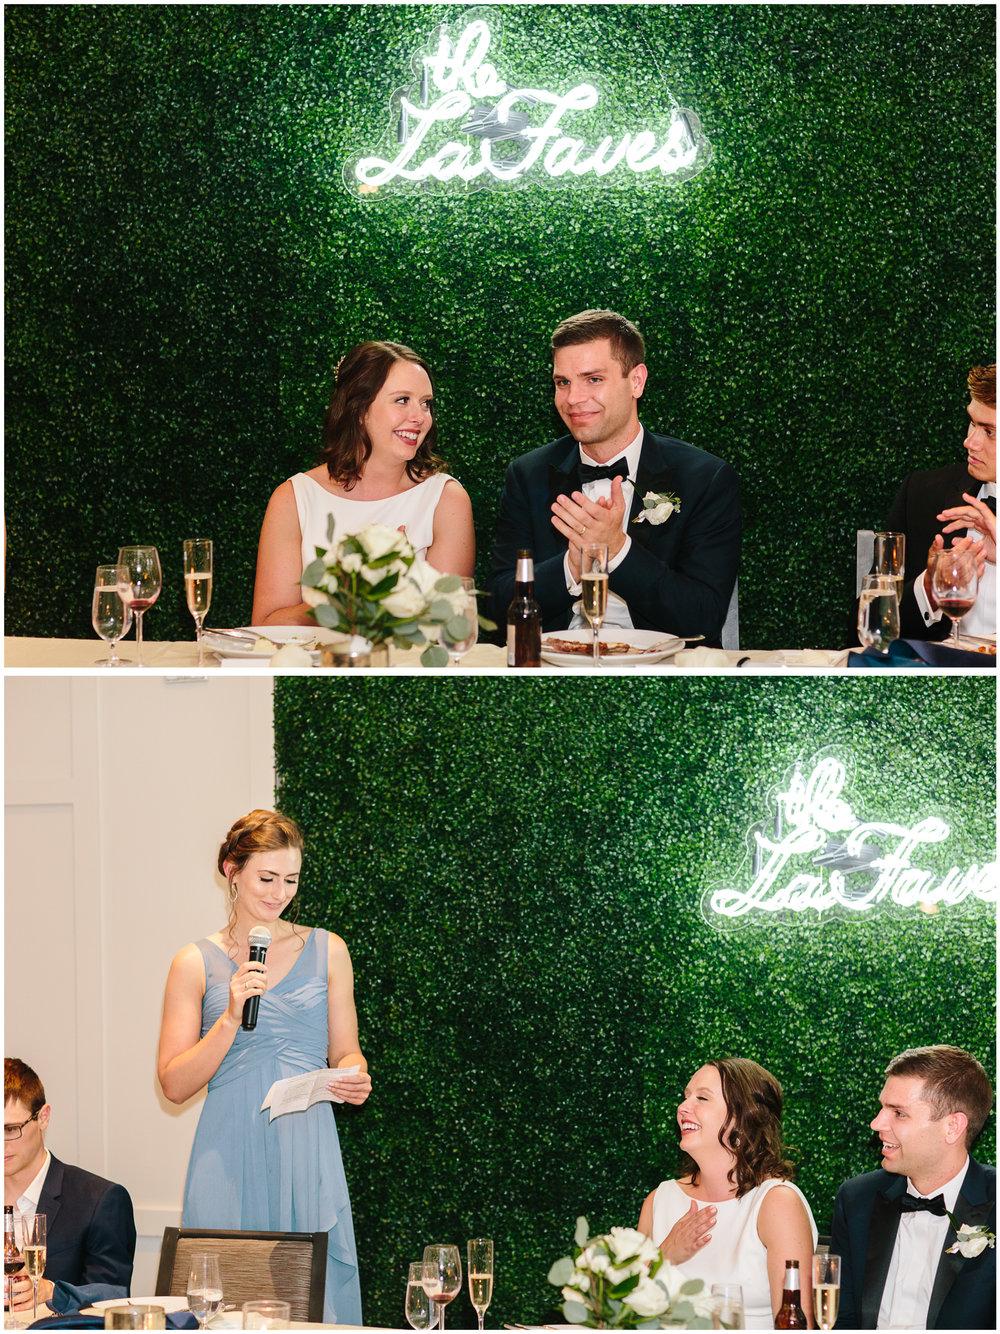 JW_Marriott_Wedding_58.jpg